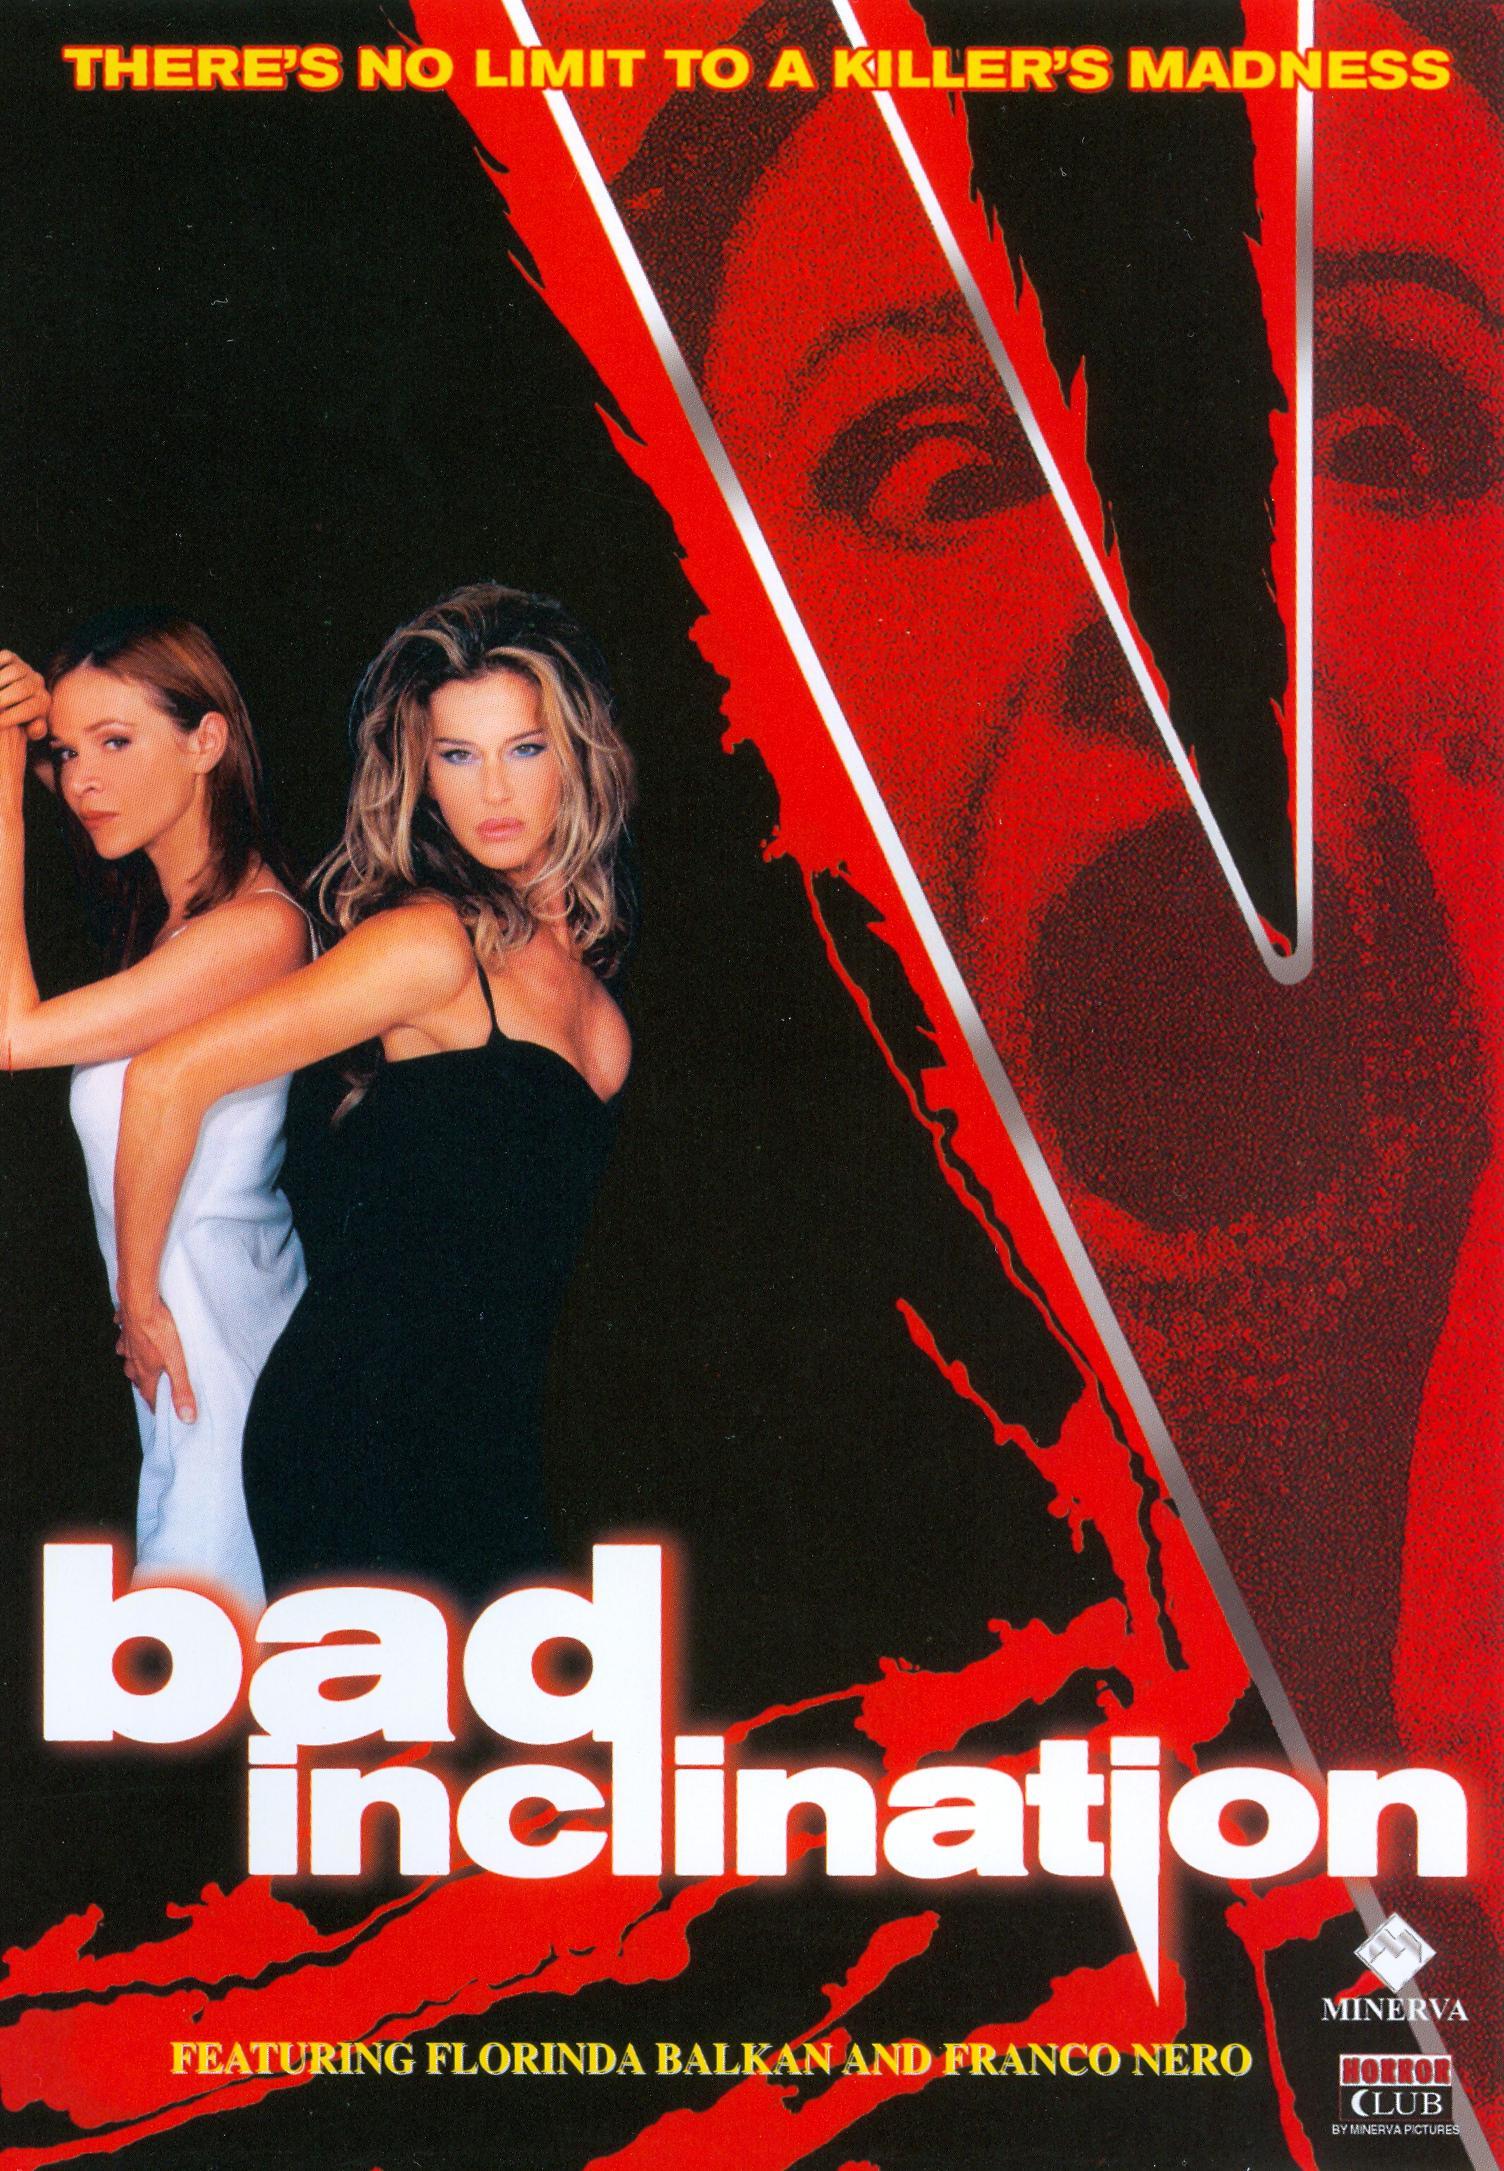 Bad Inclination